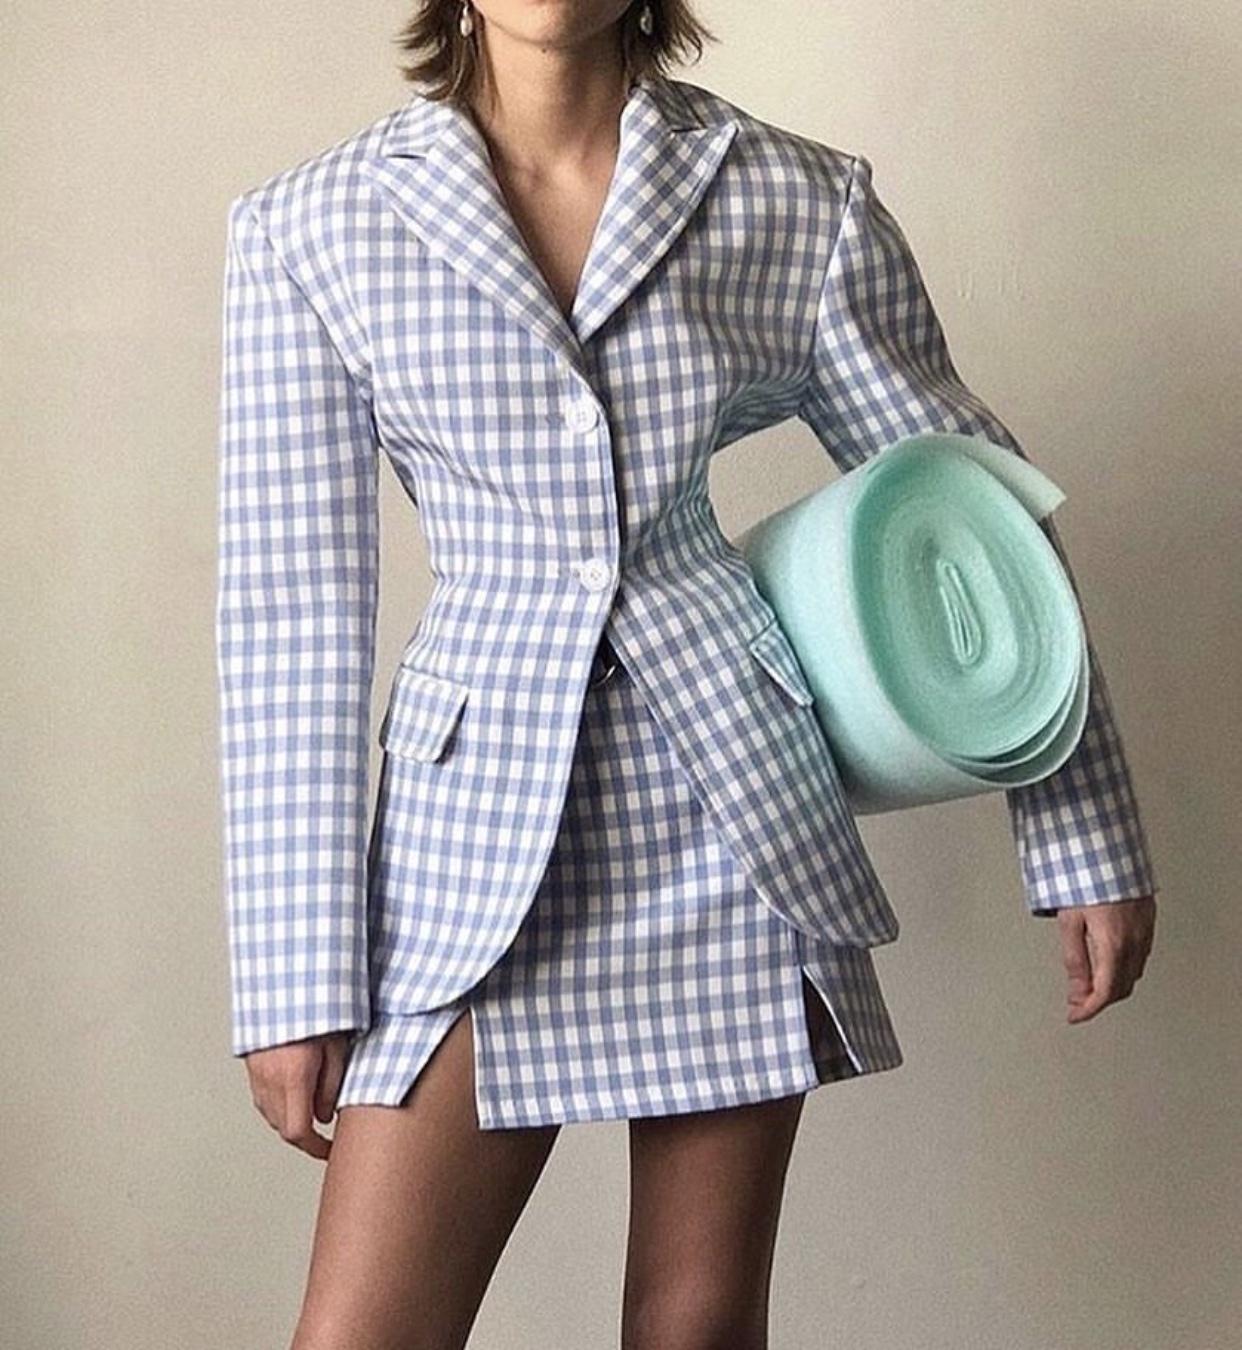 THE FRANKIE SHOP  //  Blazer  |  Skirt